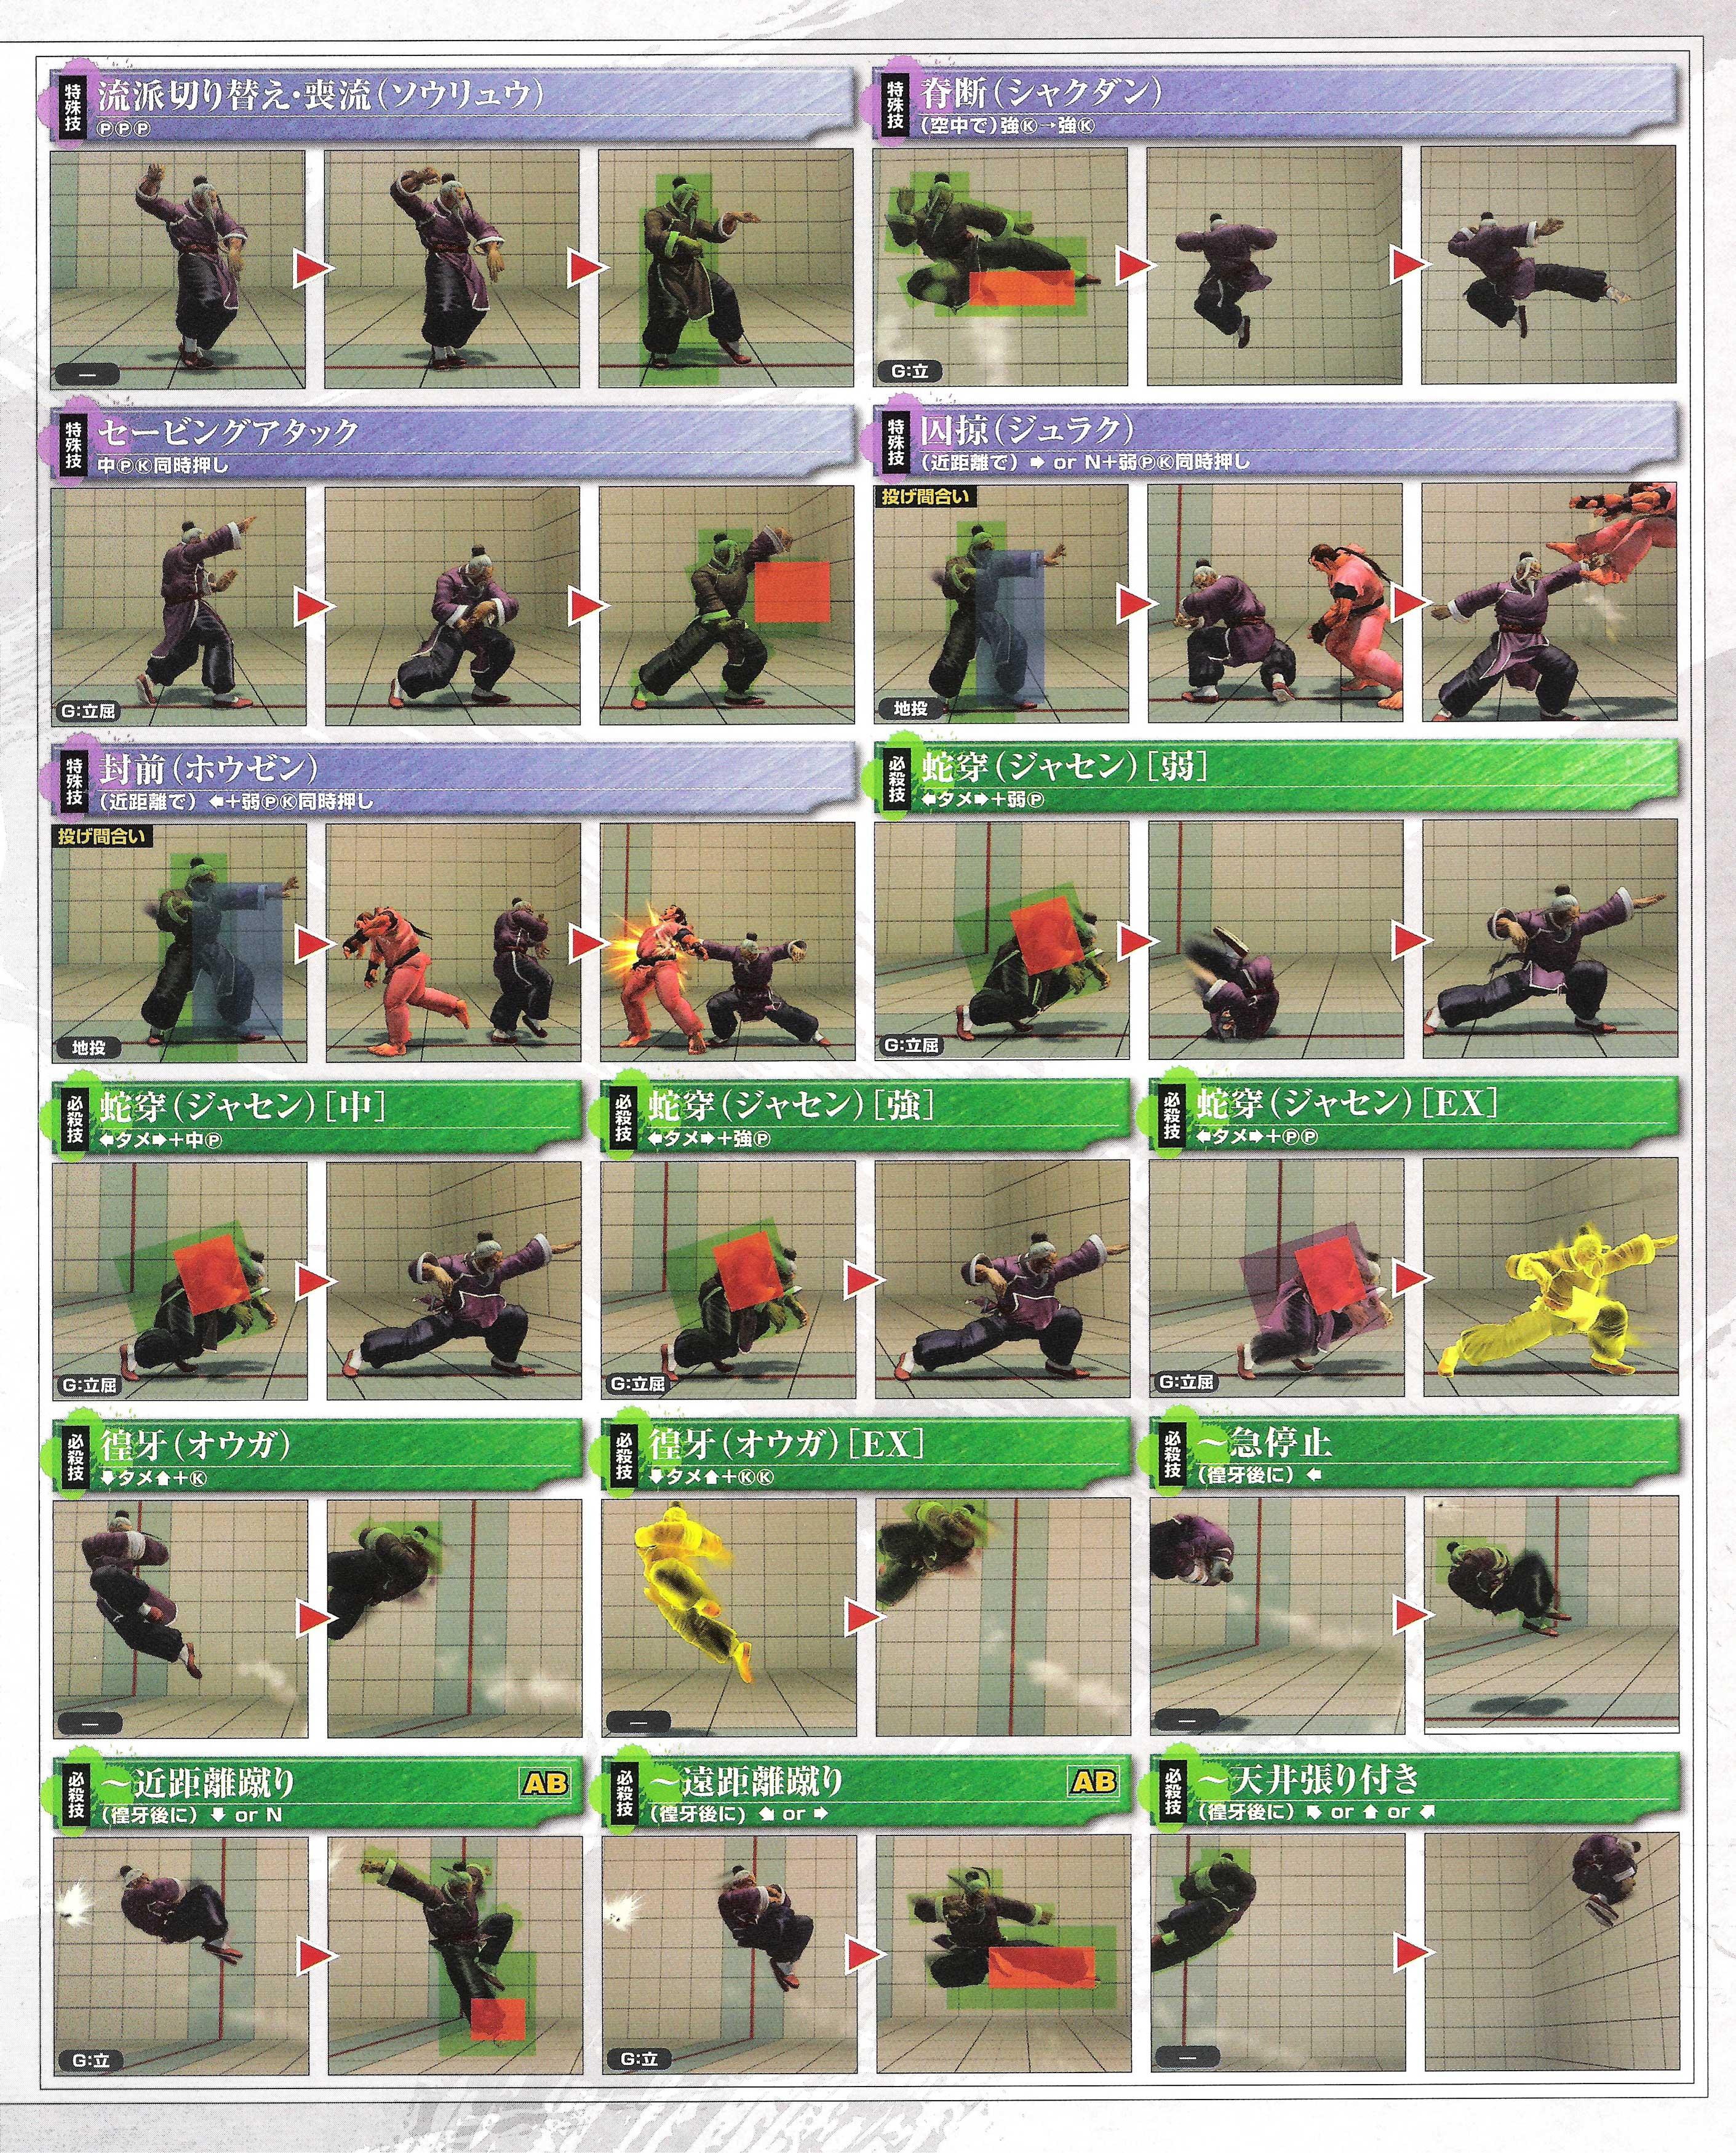 Gen's hit box information for Super Street Fighter 4 Arcade Edition image #2